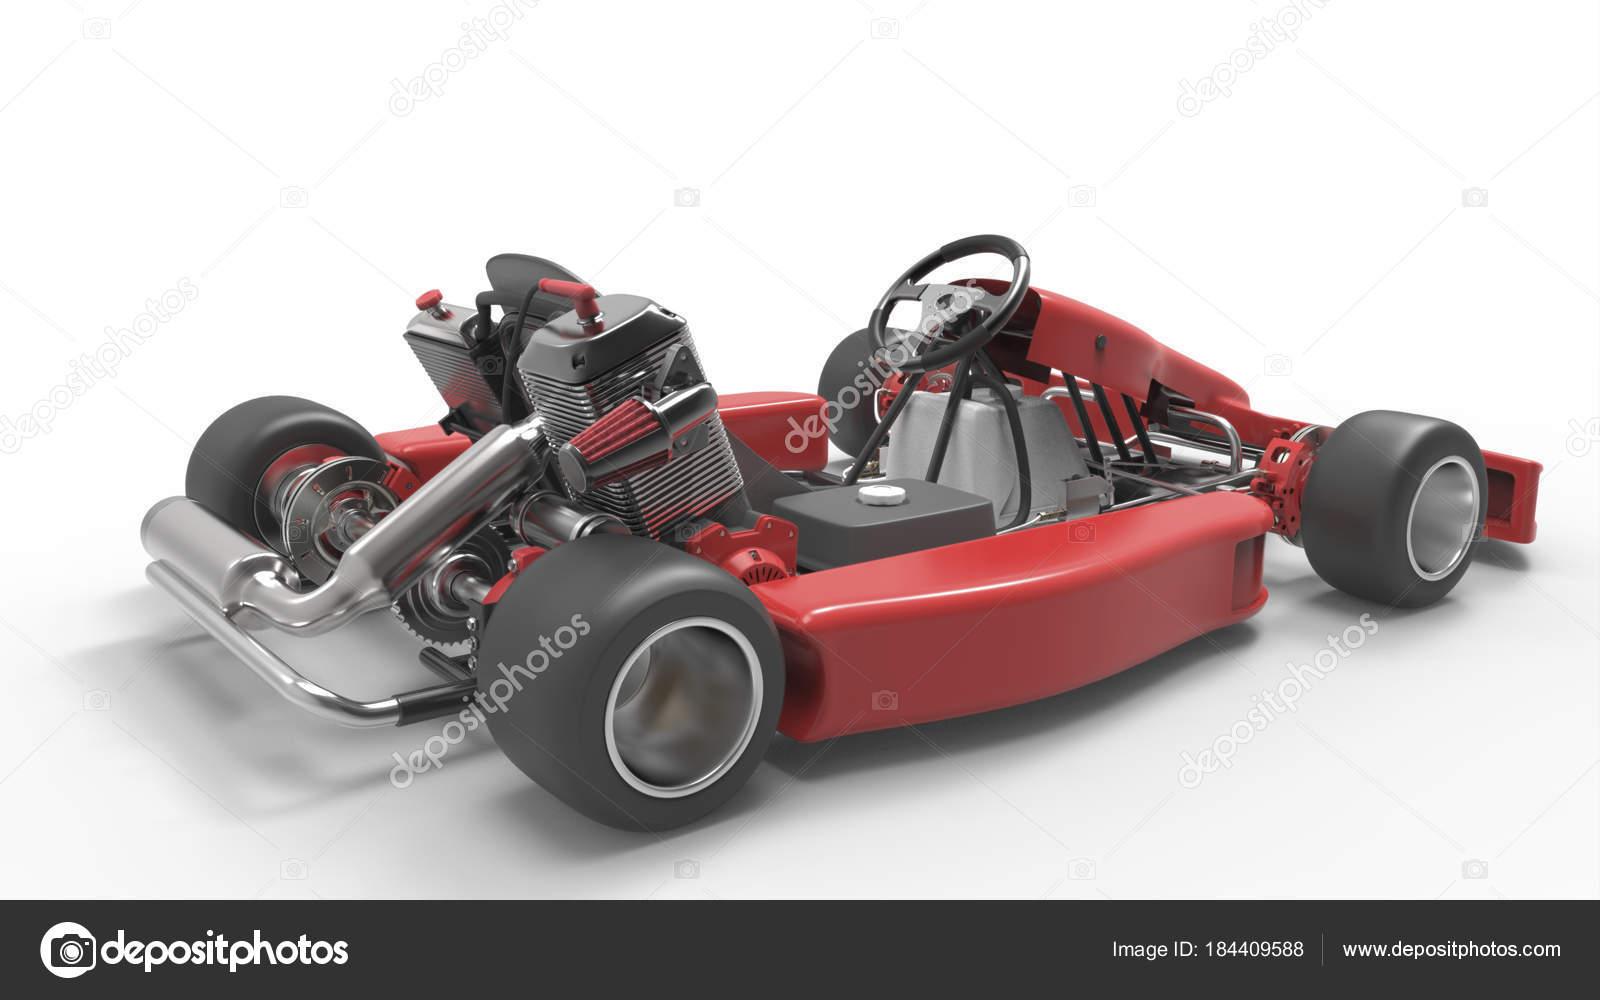 Go Kart Car Karting 3d Rendering Stock Photo C Andrija Pajtic